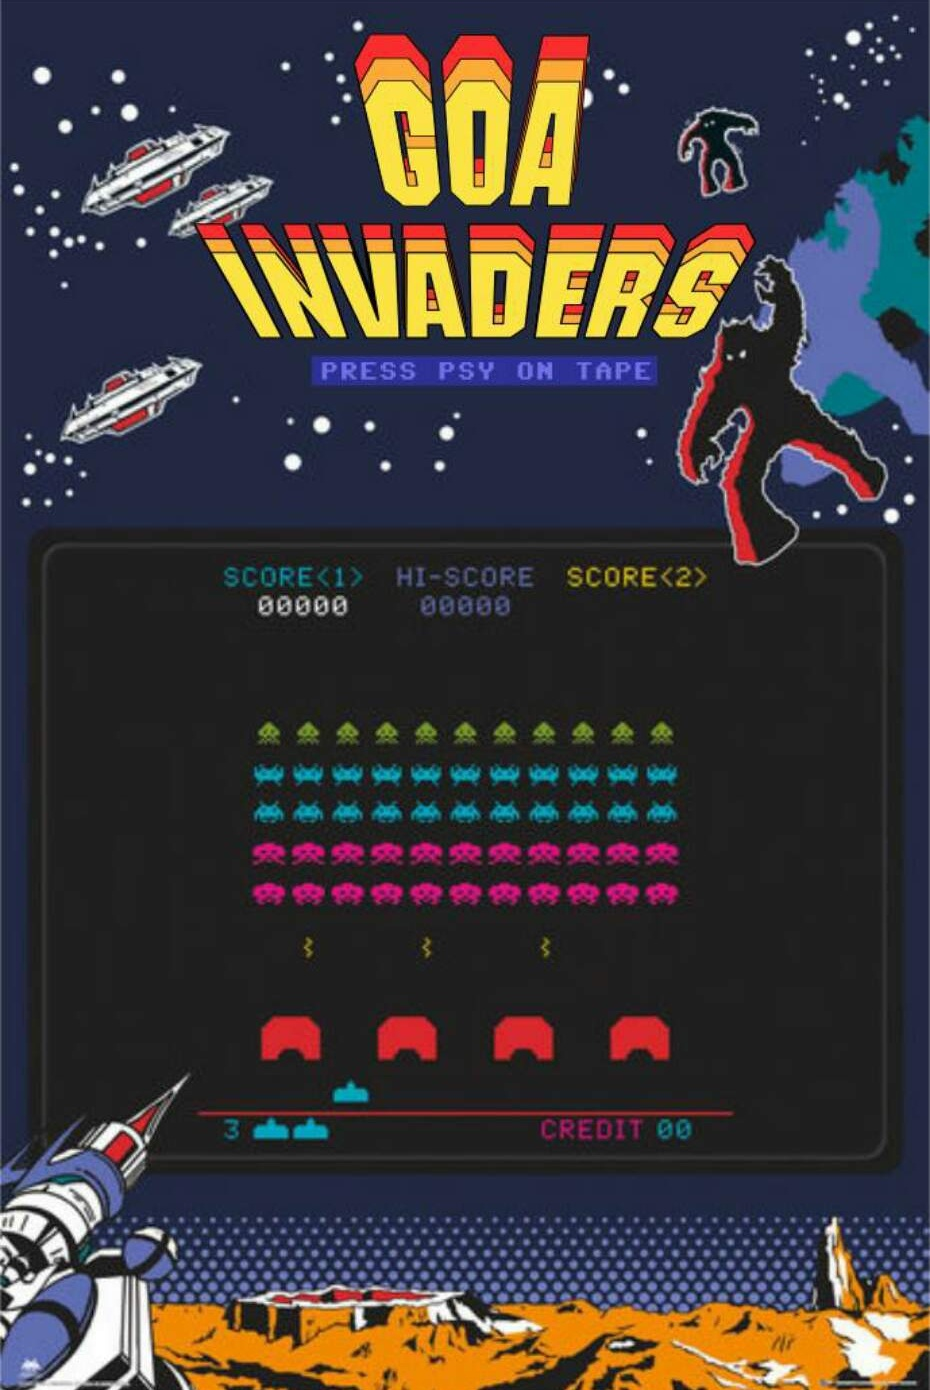 Goa Invaders CSOA TDN - Terra Di Nessuno Via Bartolomeo Bianco 4, 16127 Genova Dal 22/09/2018 Al 22/09/2018 23:00 - 05:00